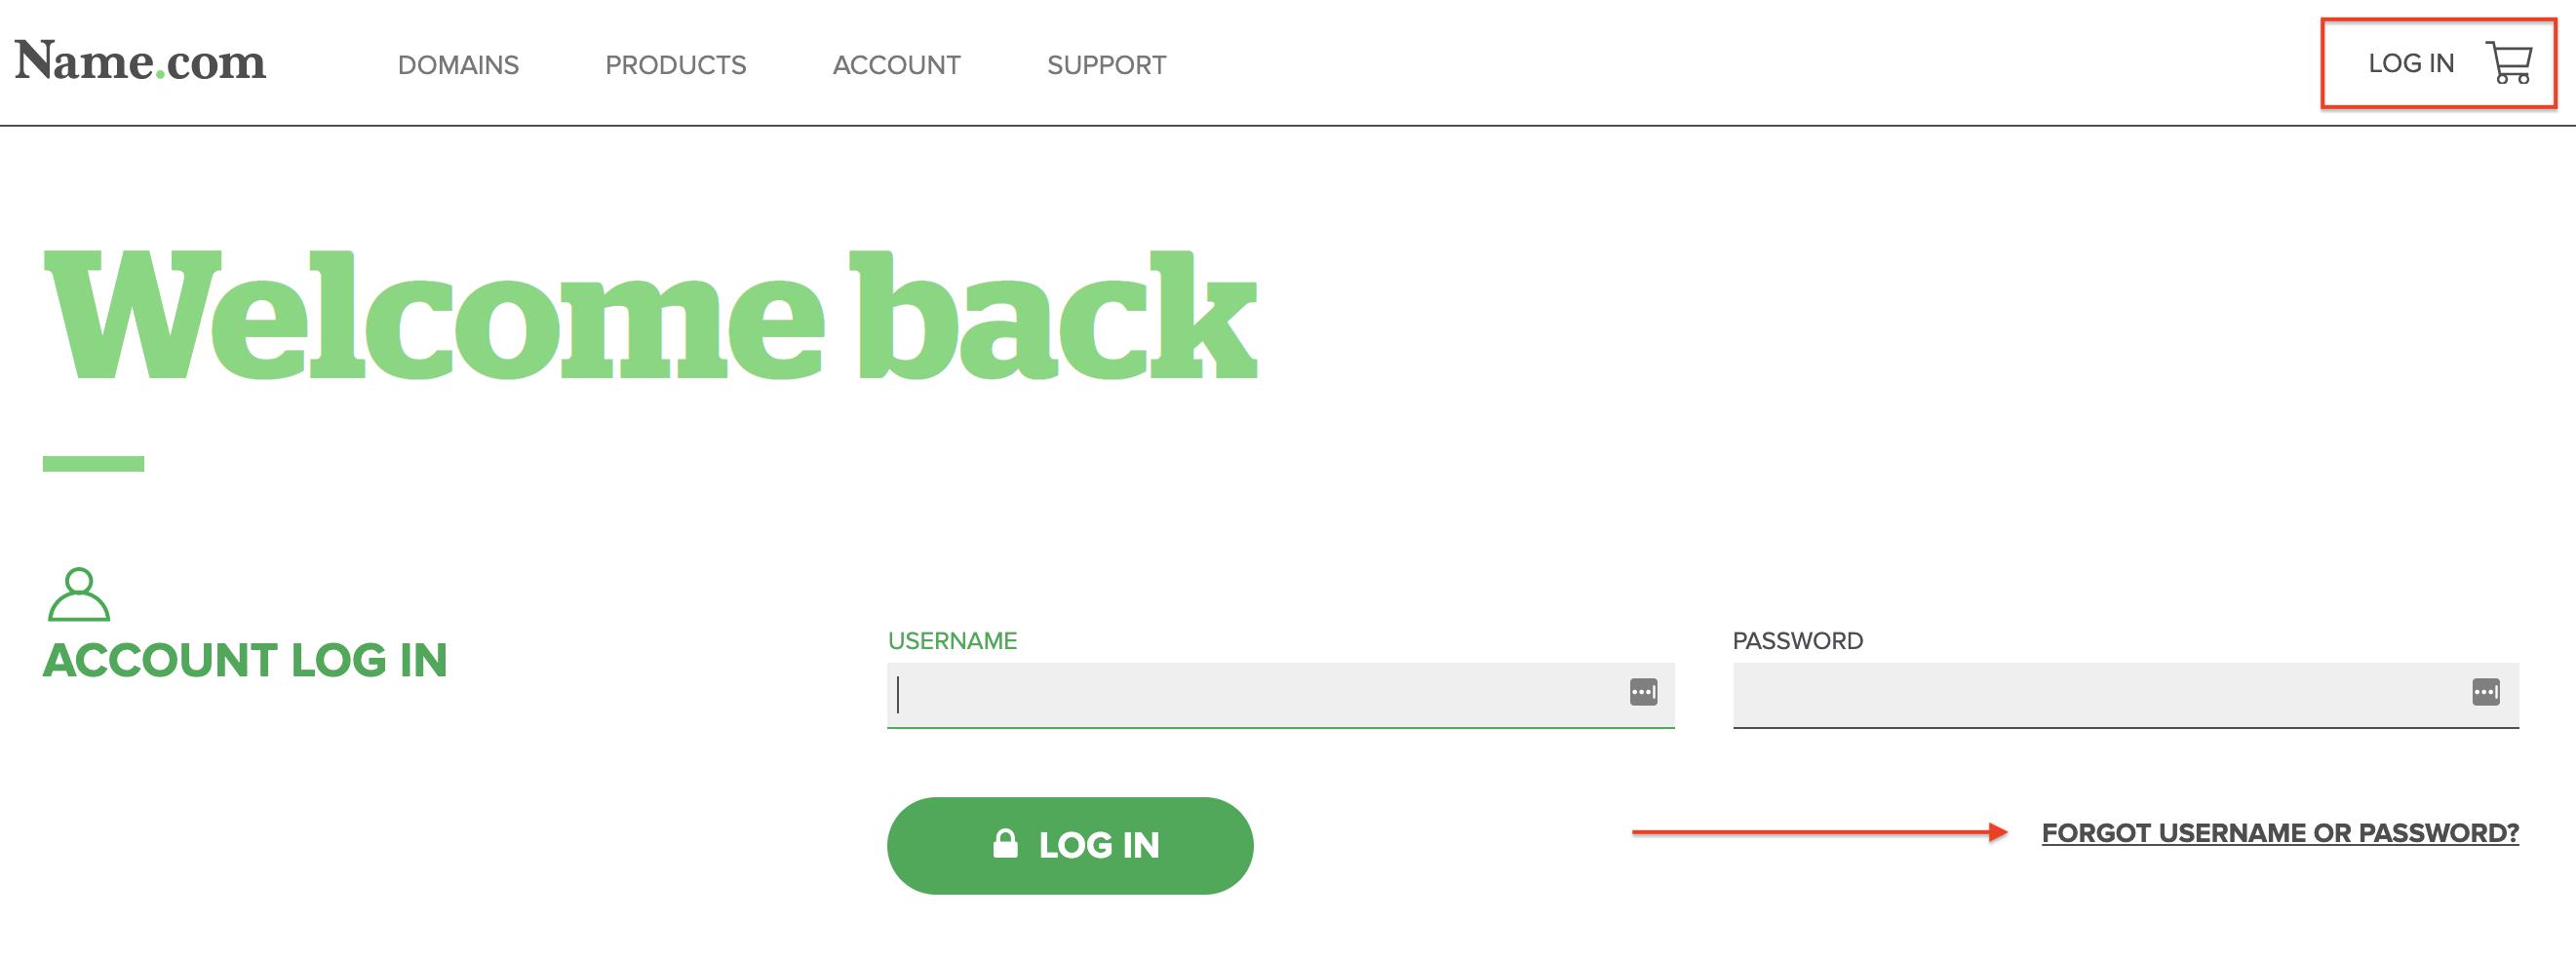 Forgot_Username_Password.png